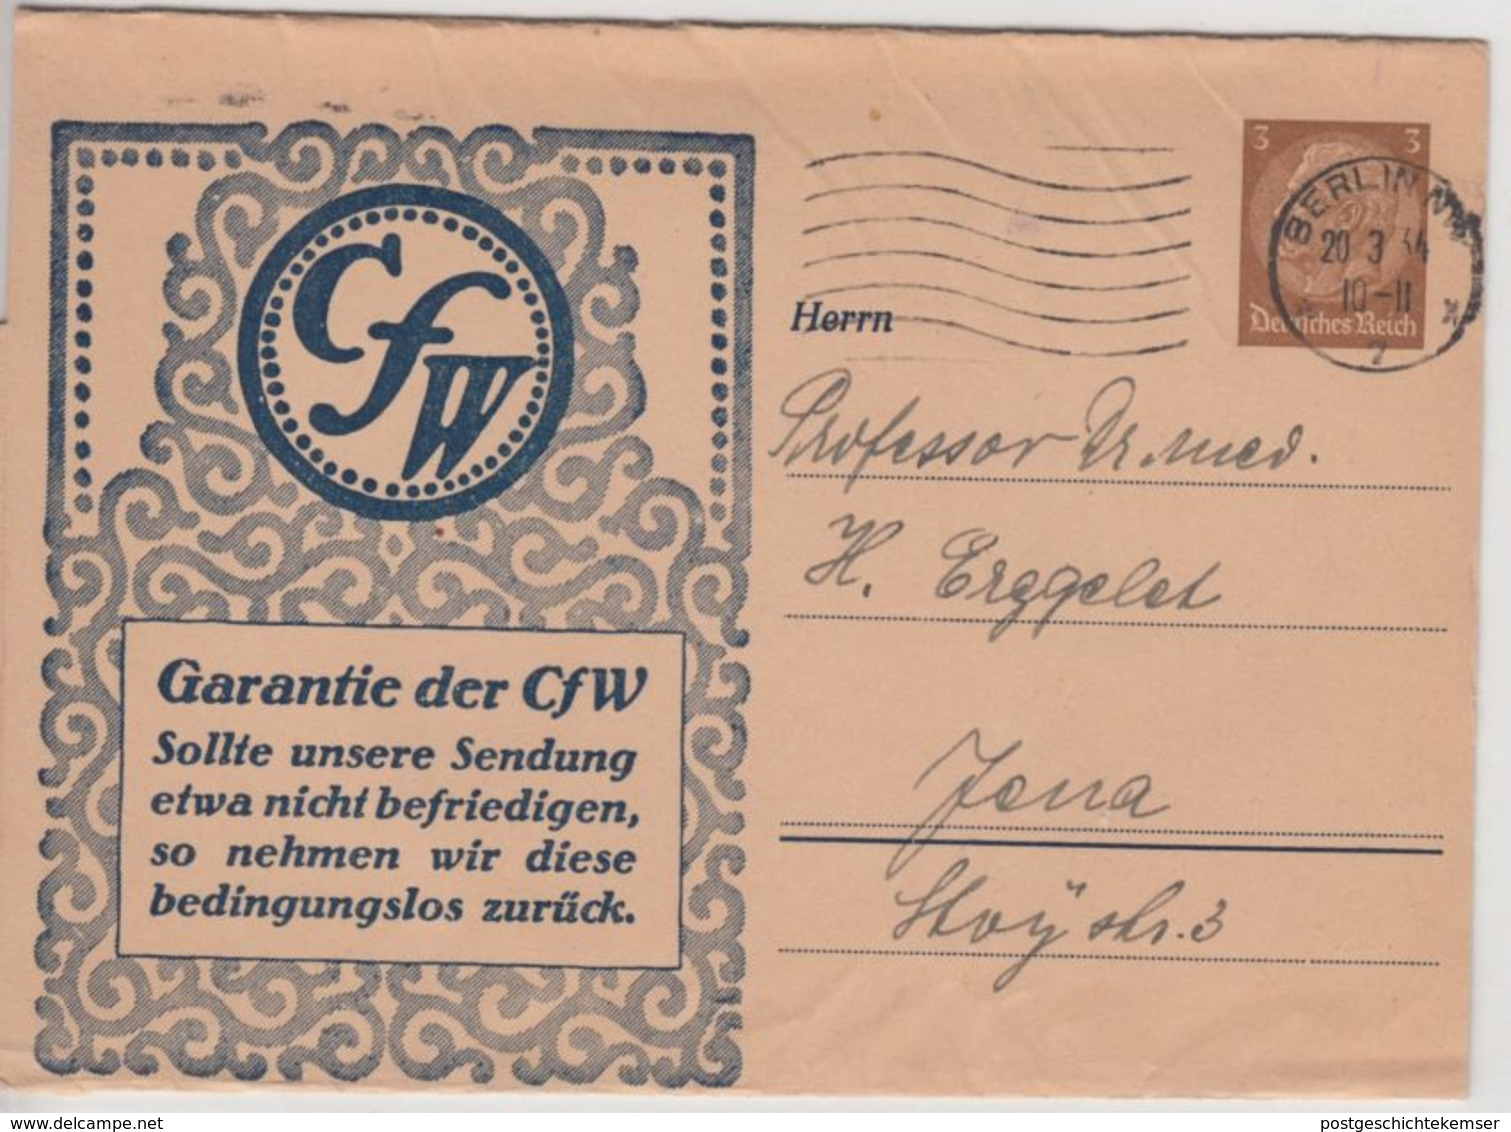 DR - CfW, 3 Pfg. Hindenburg, Privat-GA-Streifband, Berlin - Jena 1934 - Germany